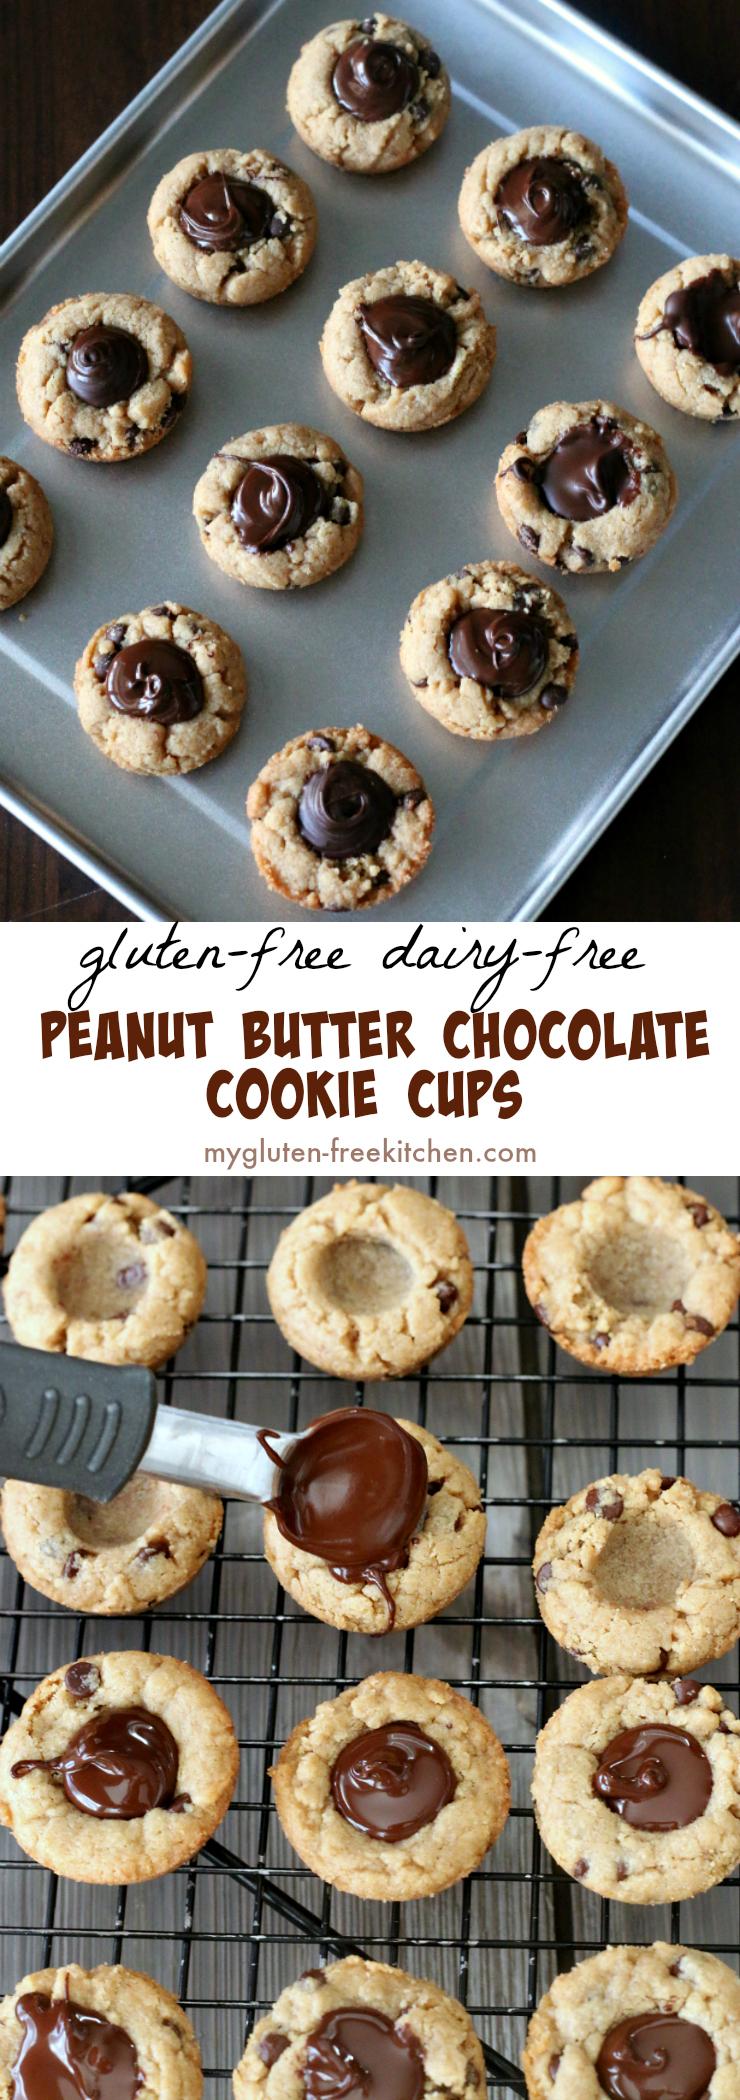 Gluten-free Peanut Butter Chocolate Cookie Cups dairy-free too. Fun #glutenfreerecipe #glutenfreecookies